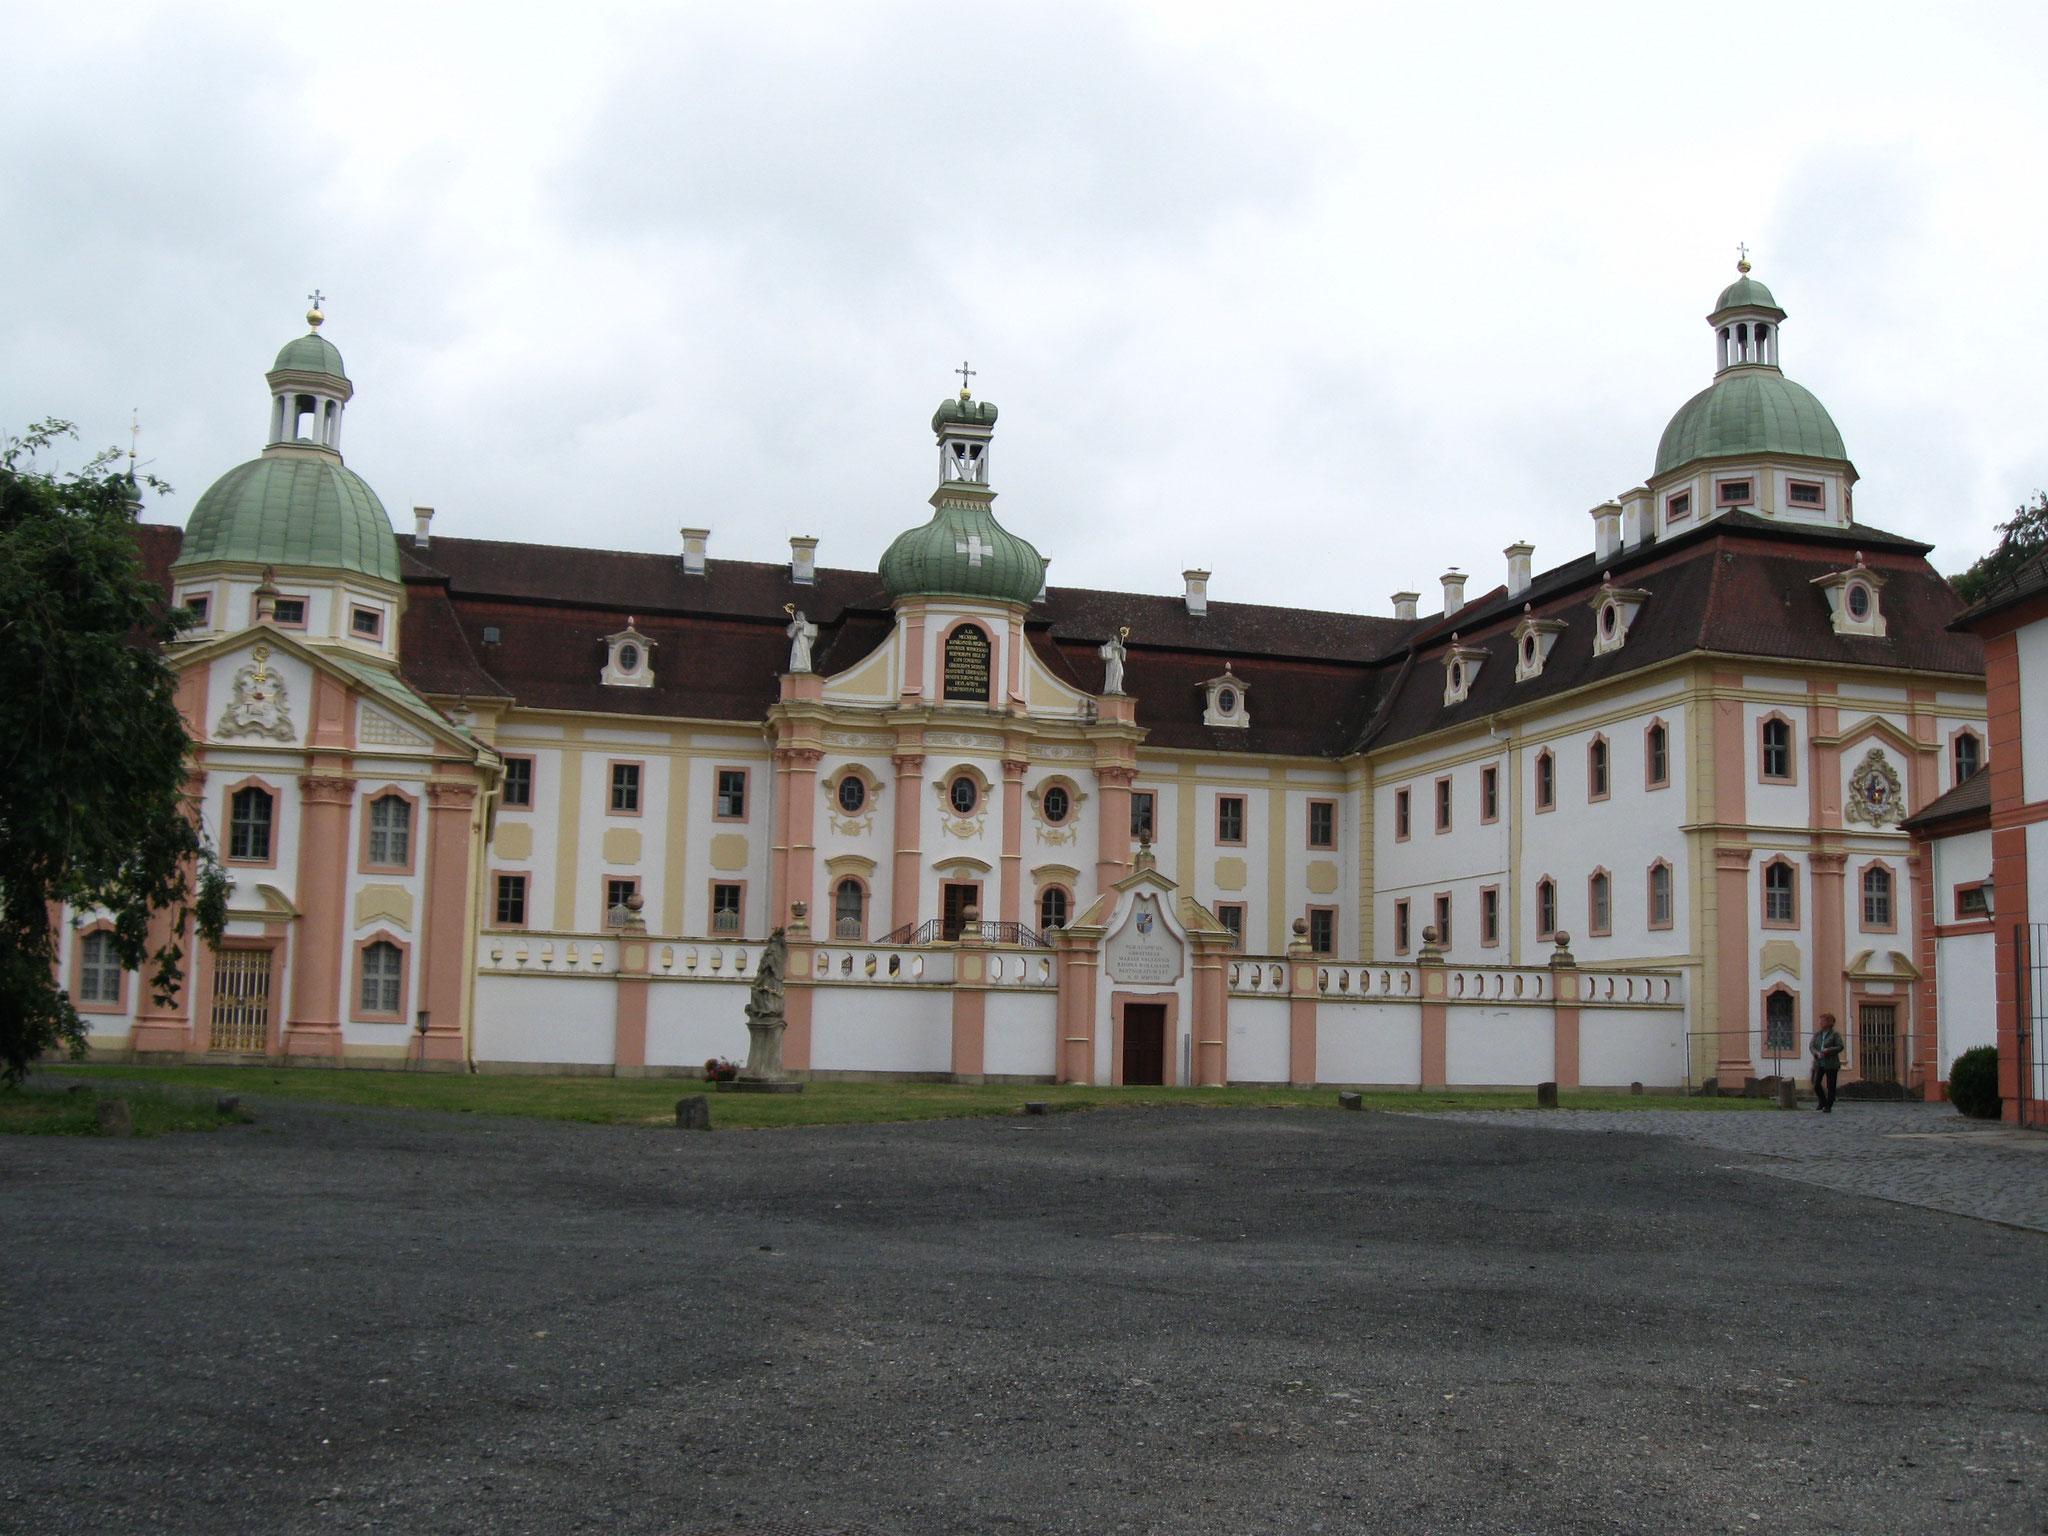 St.Marienthal Ostritz